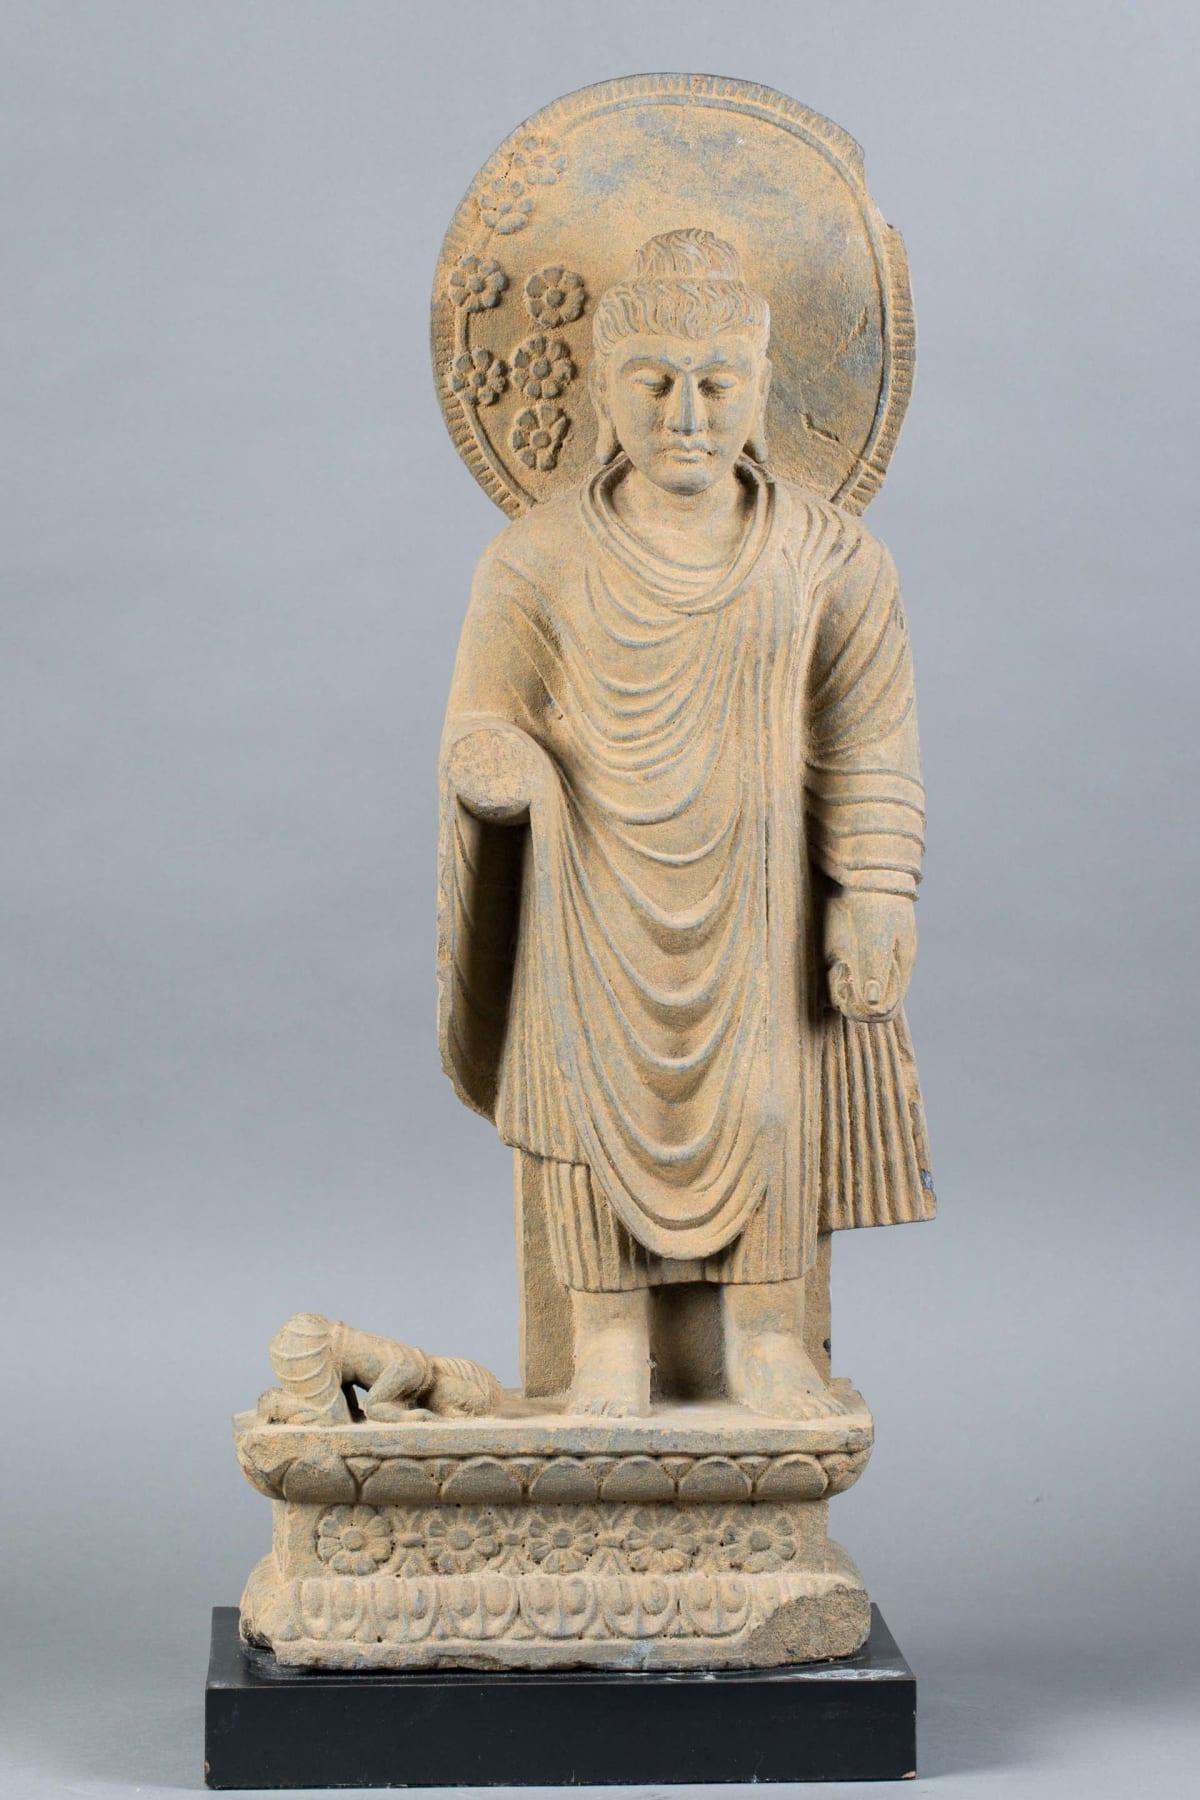 Gandharan Artefacts Barakat Gallery